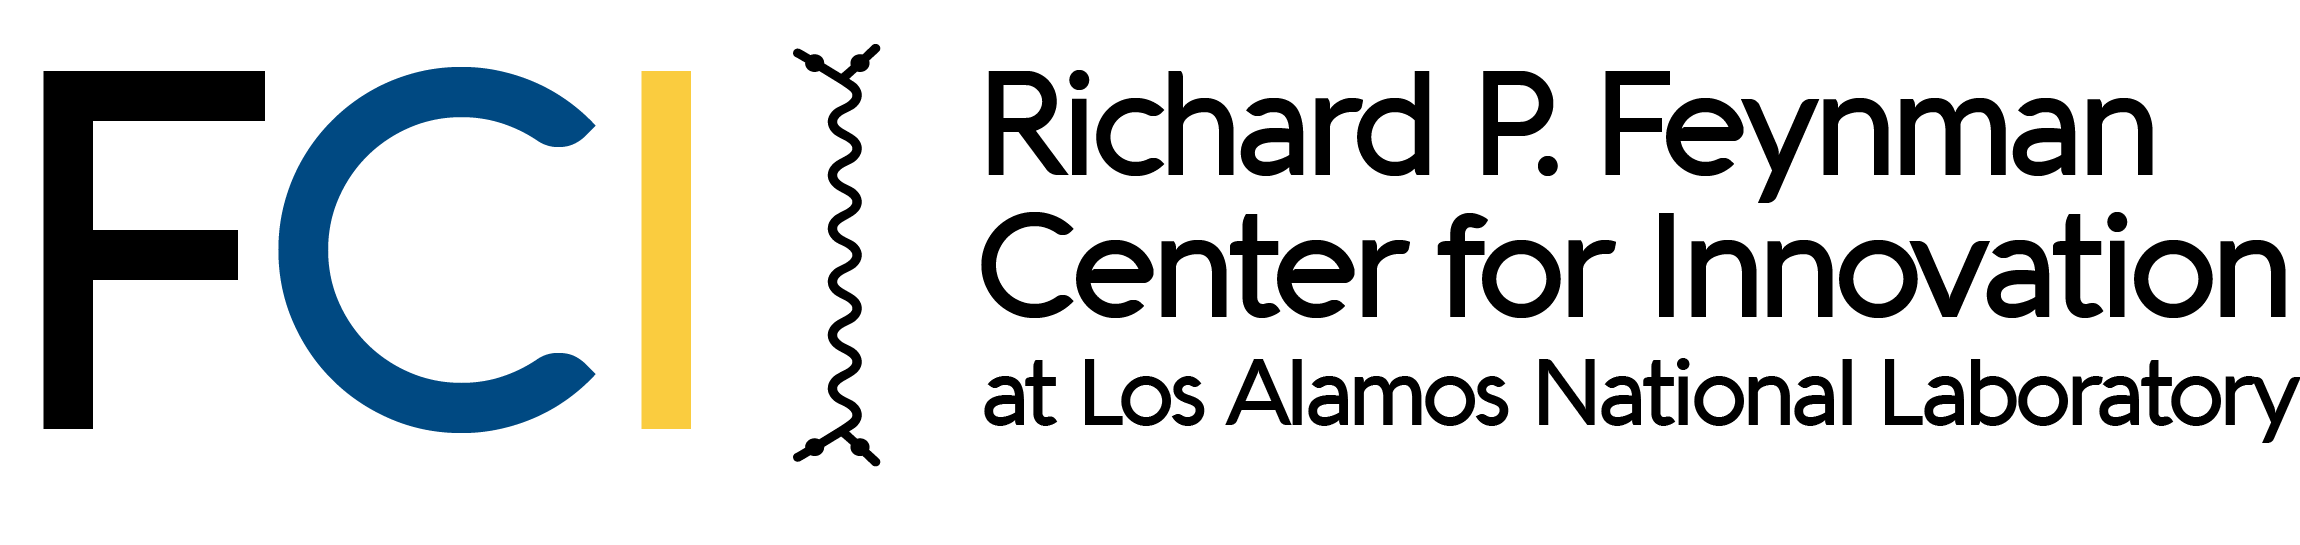 2016-fci-logo-color.png